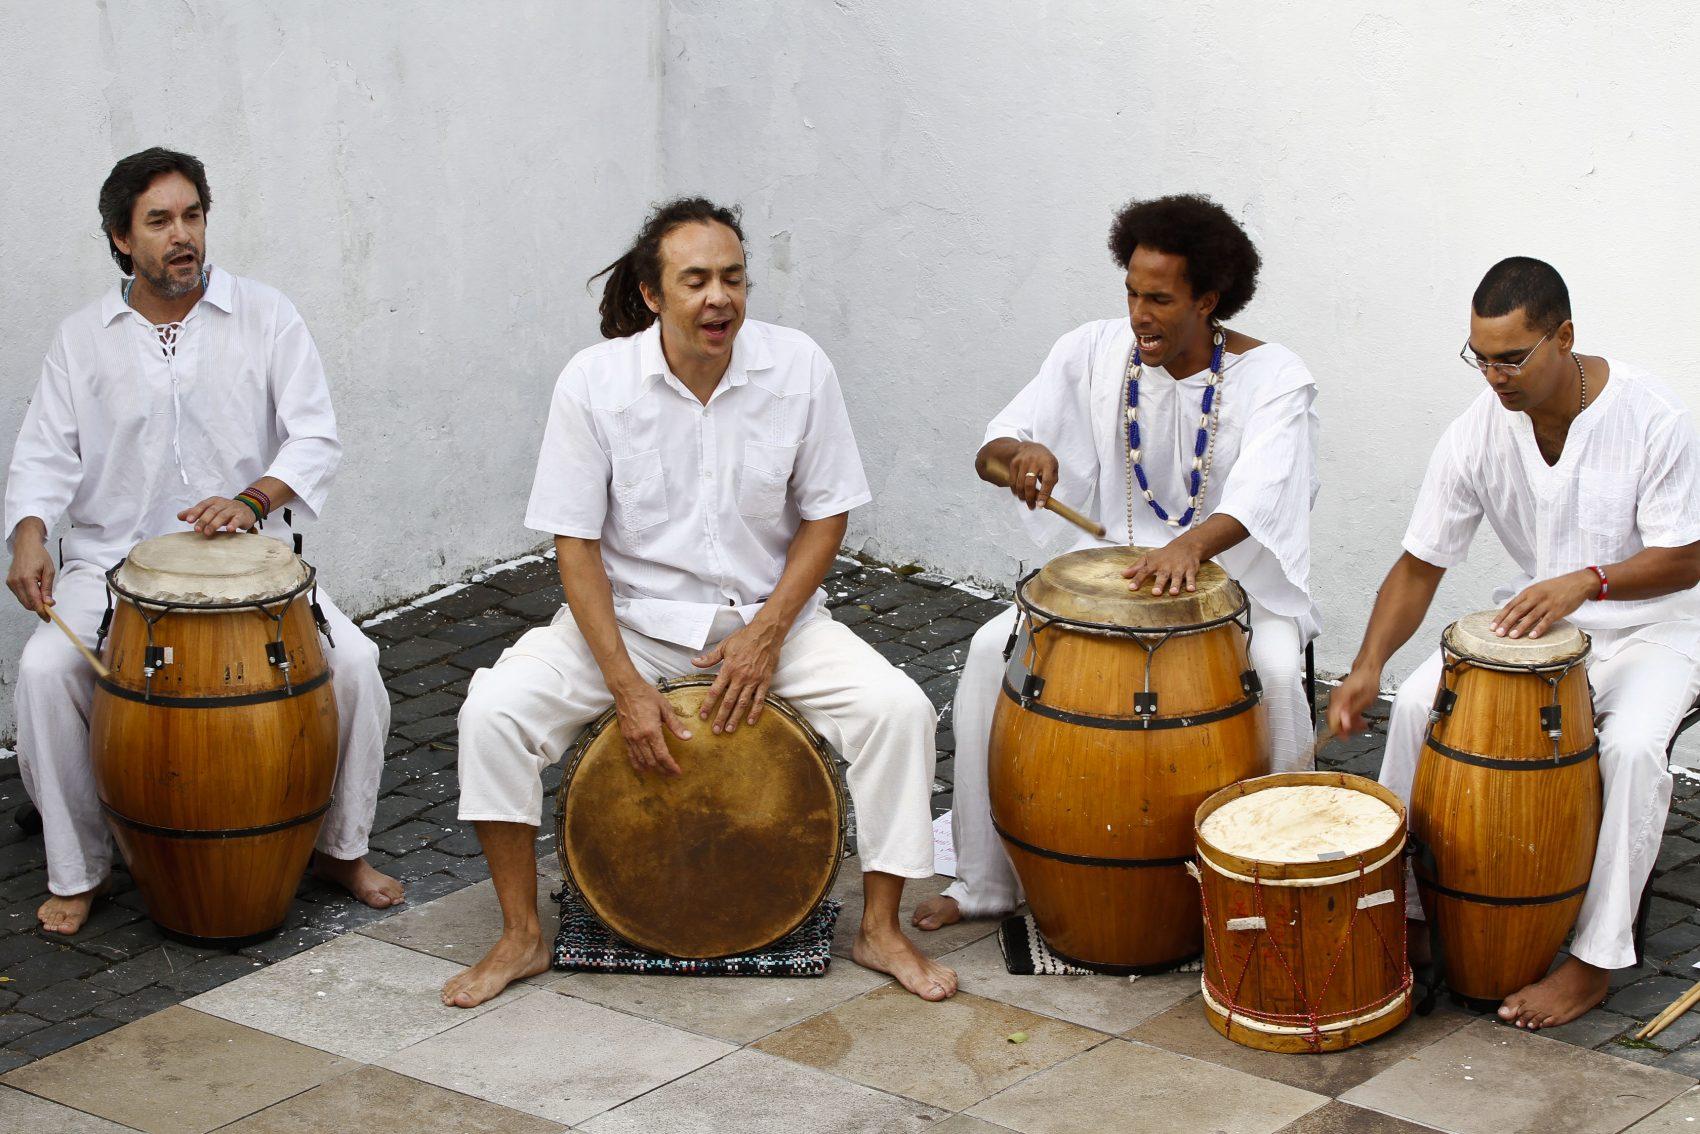 Grupo Alabê Ôni: Richard Serraria é o segundo, da esquerda para a direita, sentado sobre o tambor